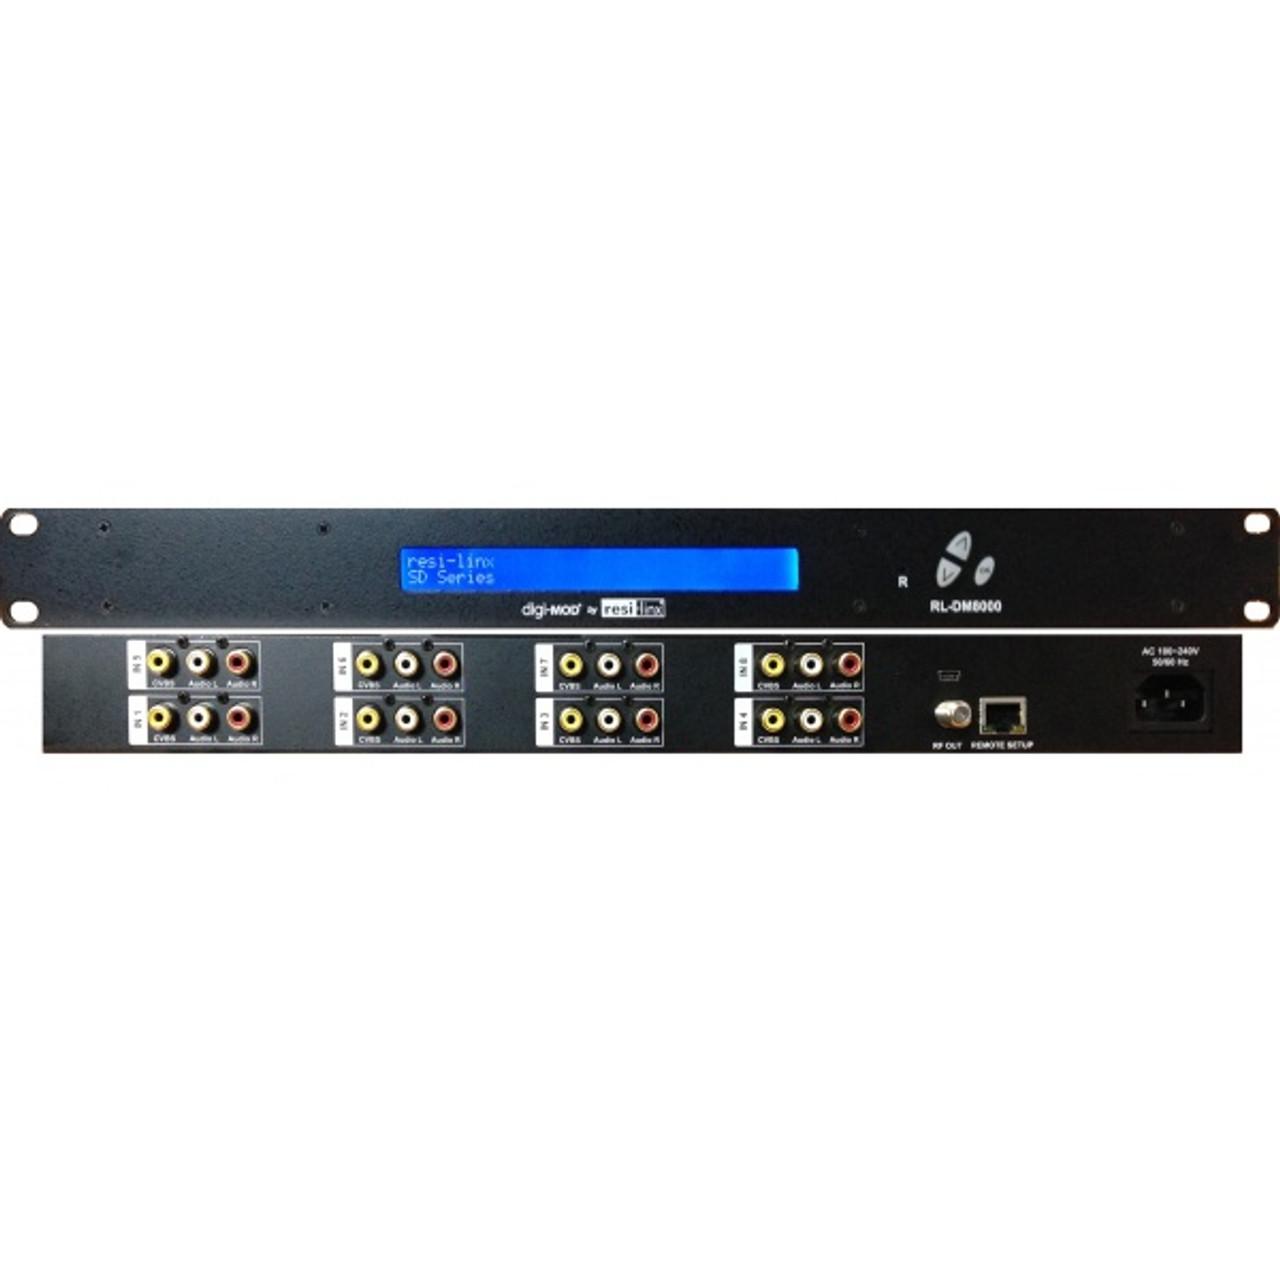 Resi-Linx DM8000 - 8 Input SD DVB-T Modulator